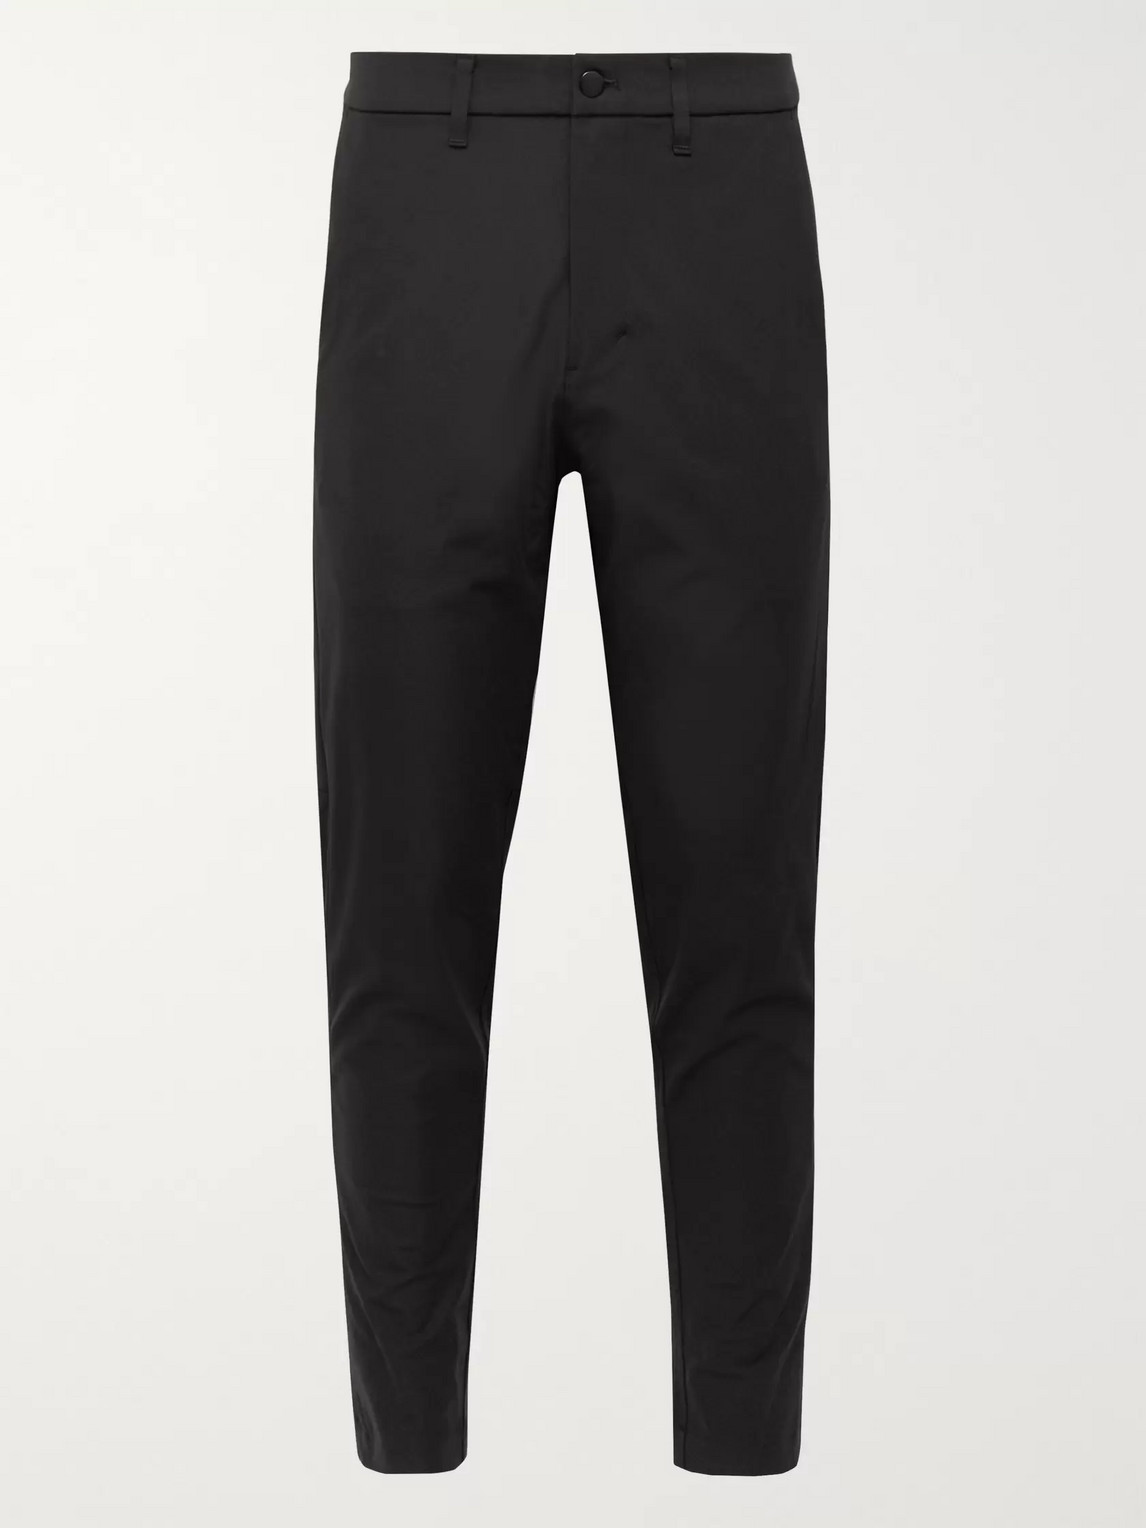 lululemon - commission slim-fit shell golf trousers - men - black